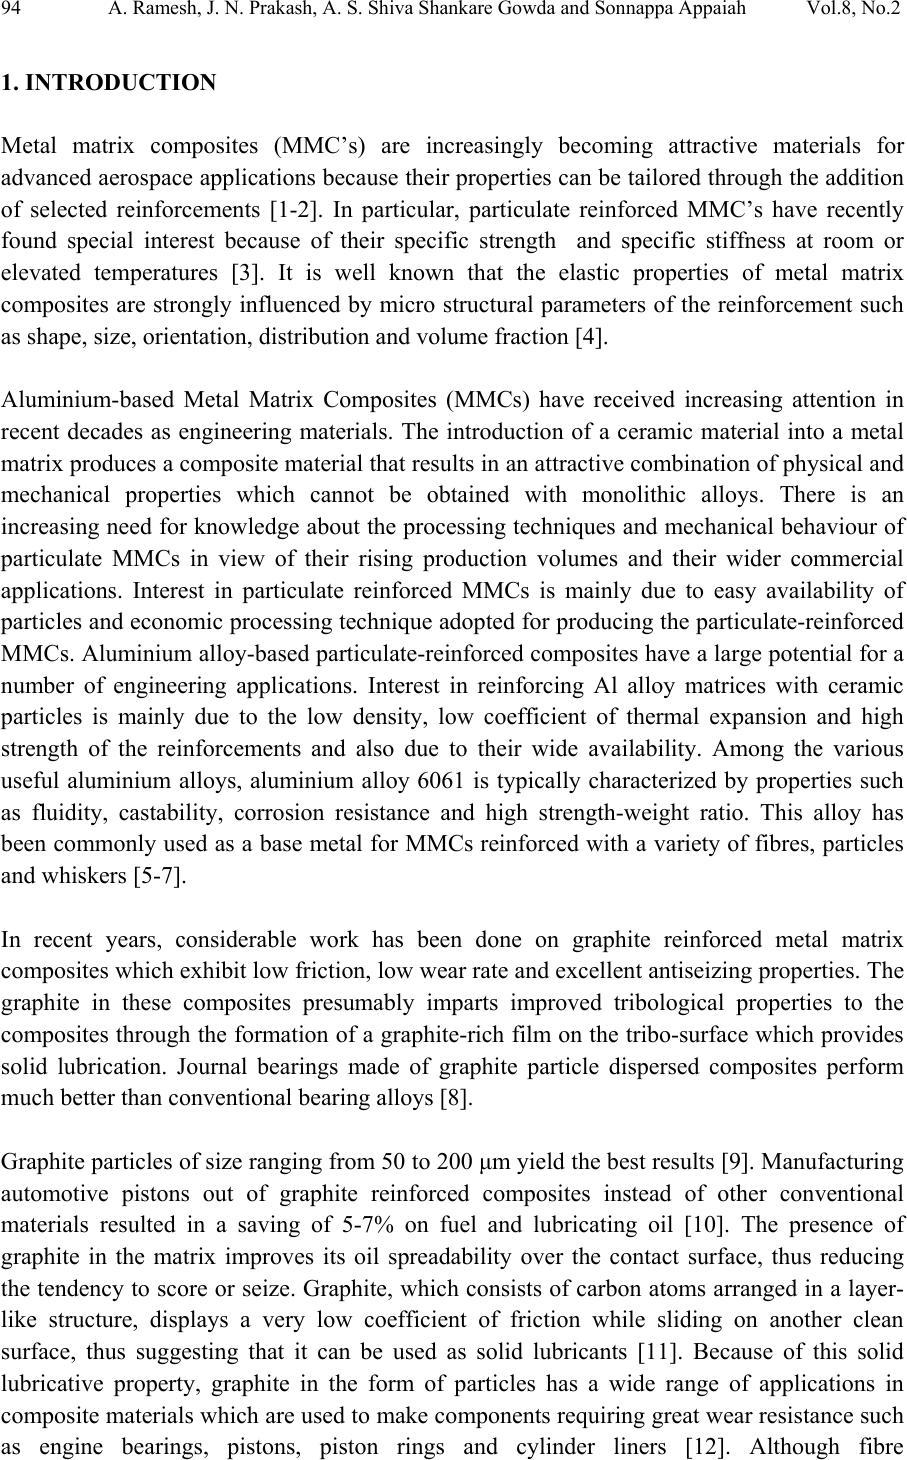 comparison of the mechanical properties of al6061albite and al6061graphite metal matrix composites